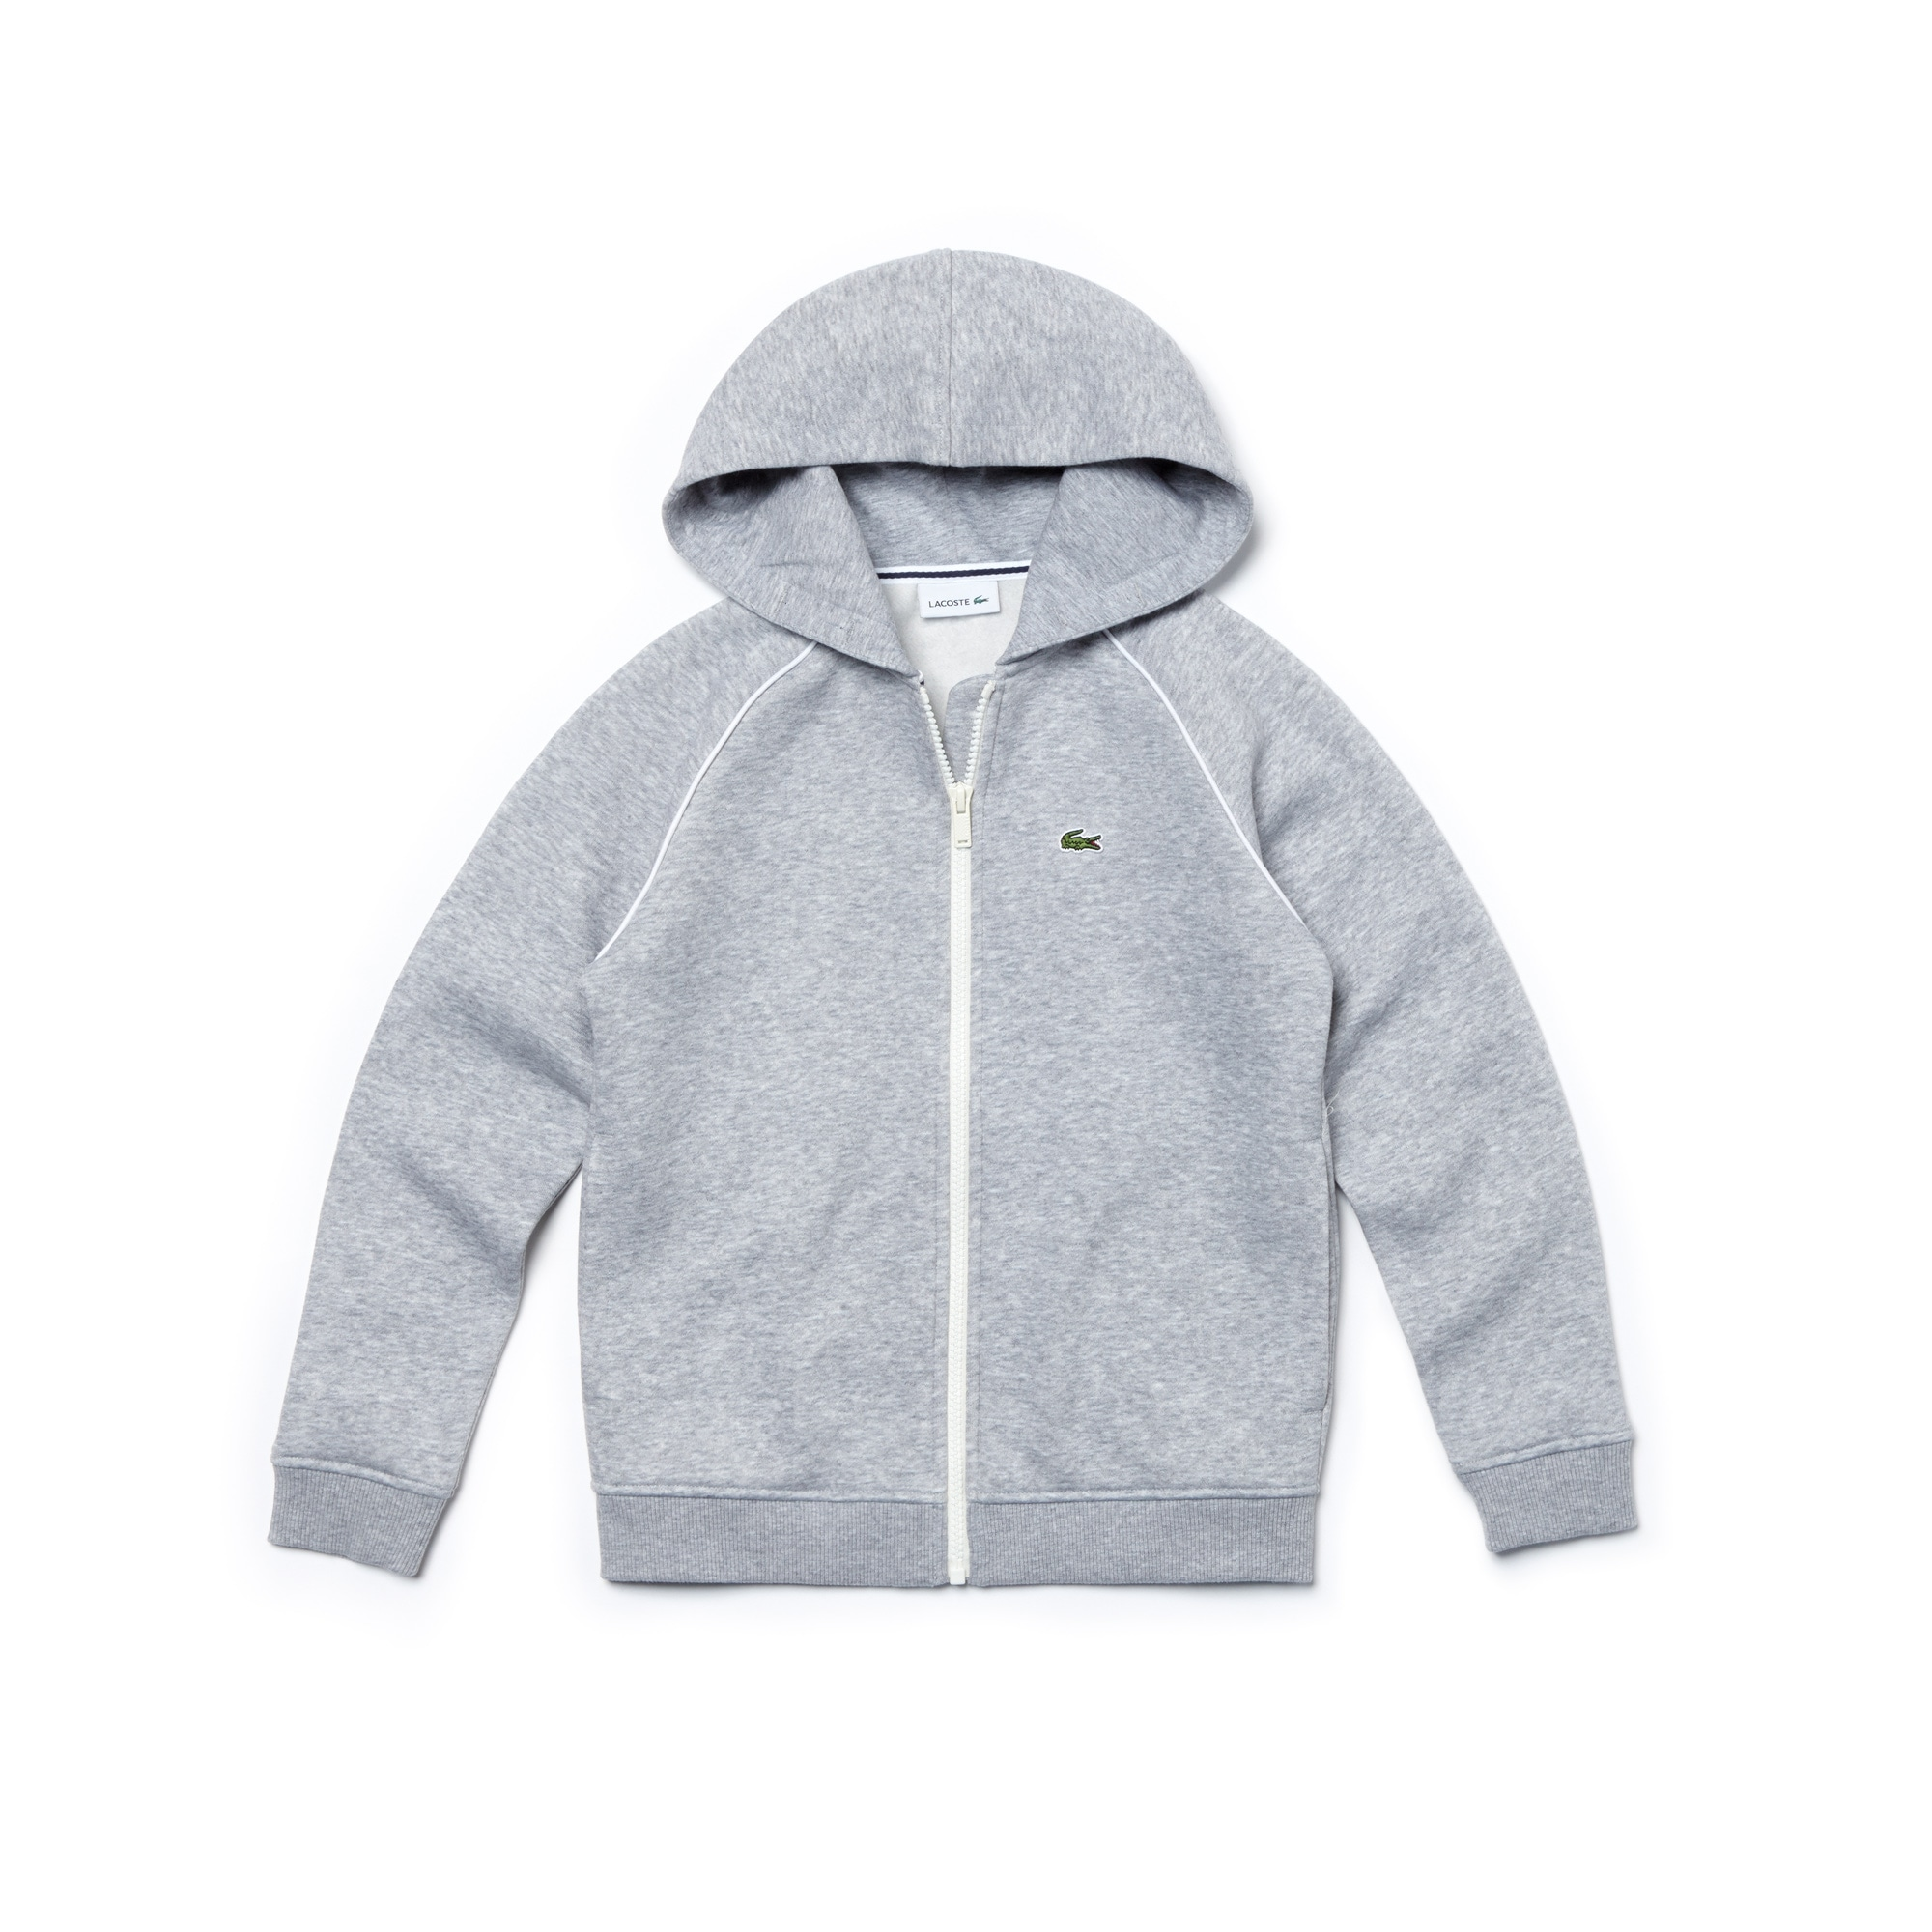 Enfant Lacoste T ShirtsPulloversamp; Manteau GarçonVêtements 4AL3Rjq5cS